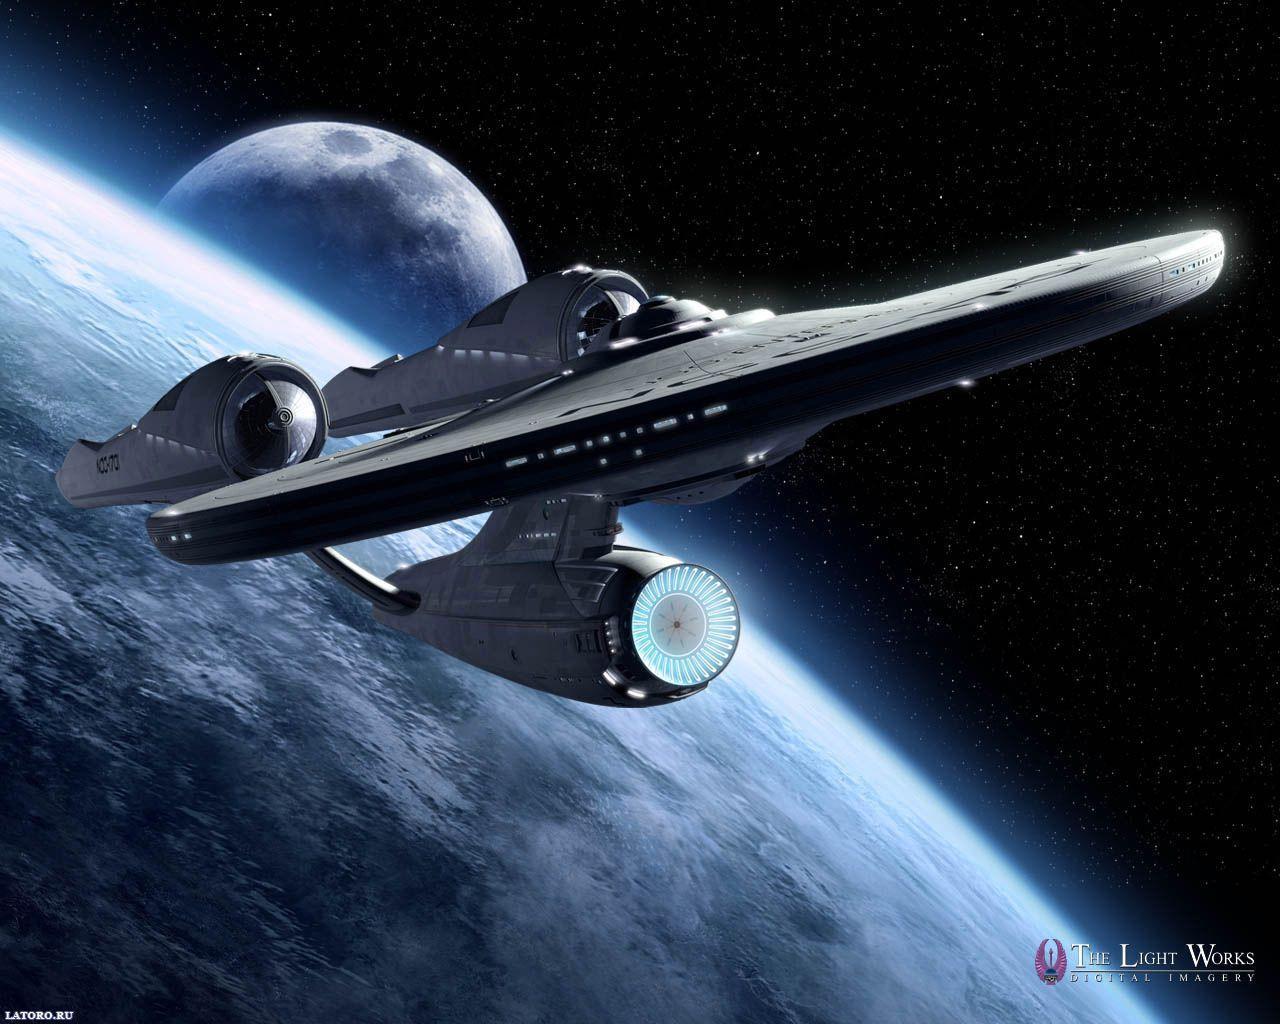 Star Trek Iphone Wallpapers Top Free Star Trek Iphone